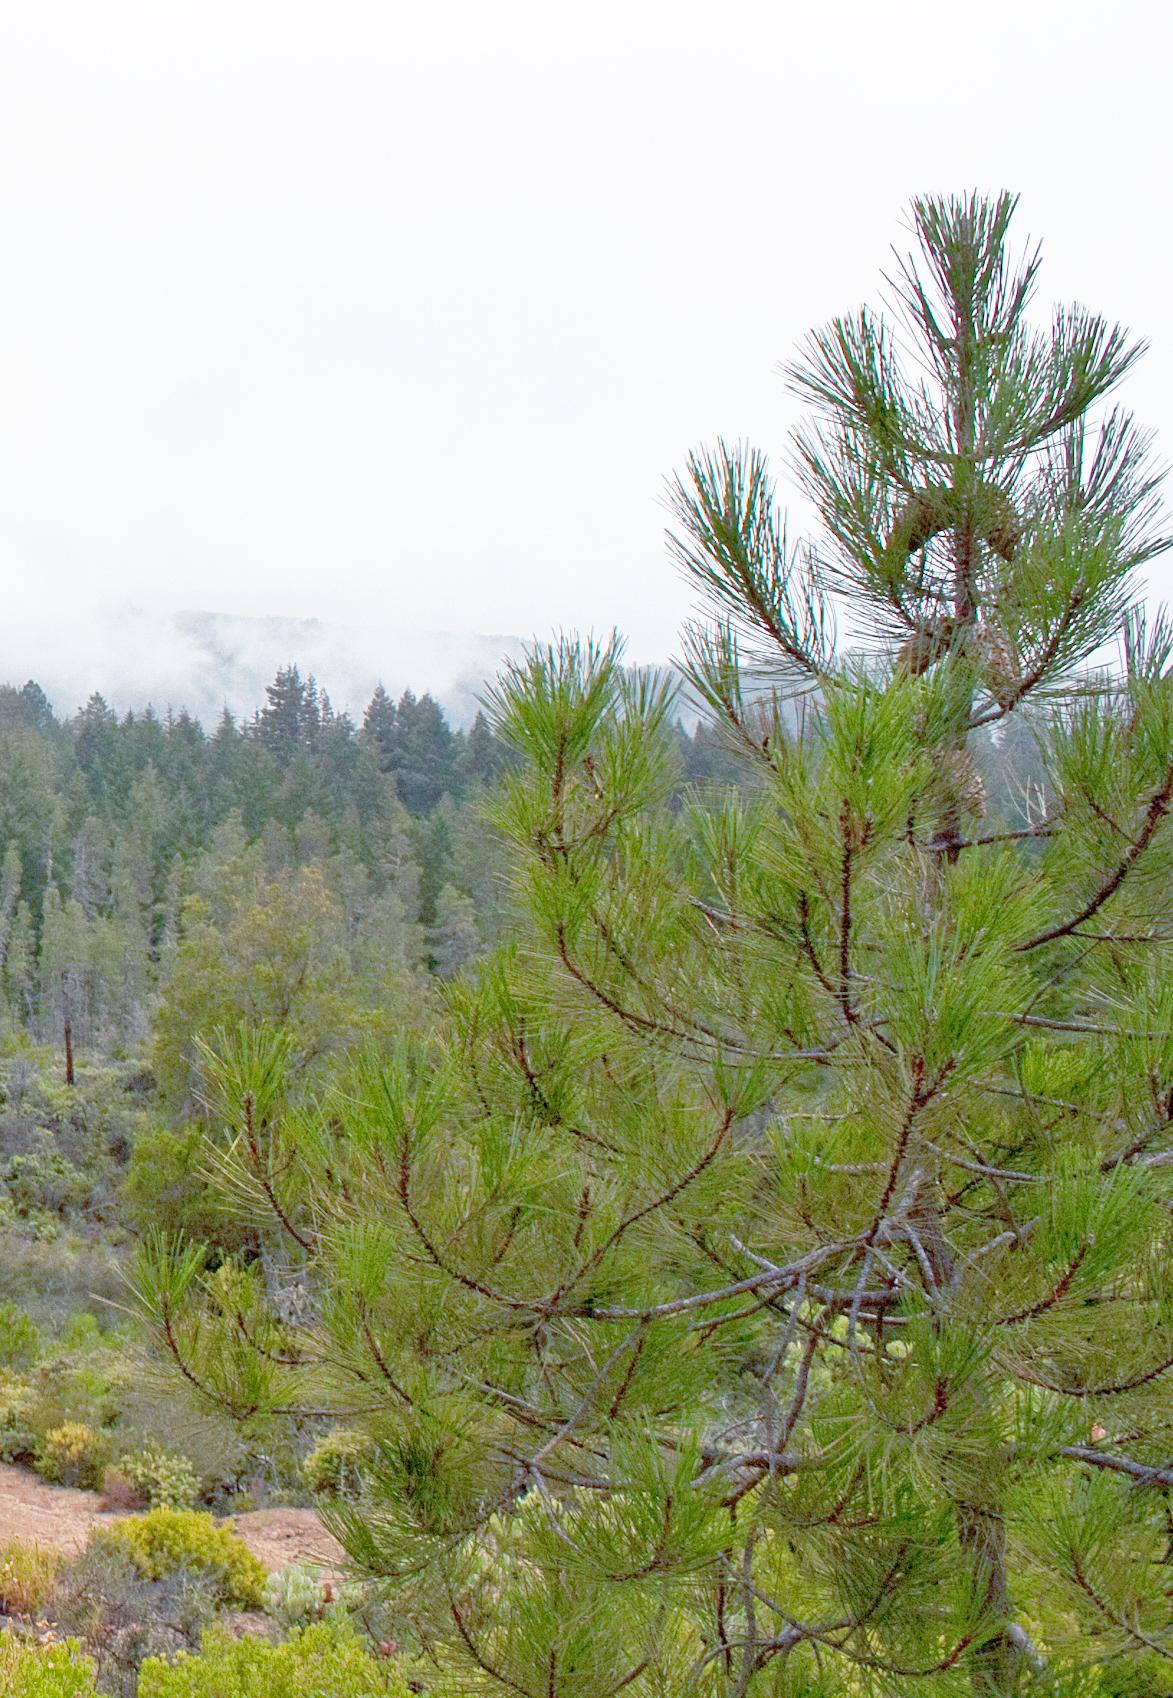 hastighet dating Boulder Colorado hastighet dating Royal Oak Michigan